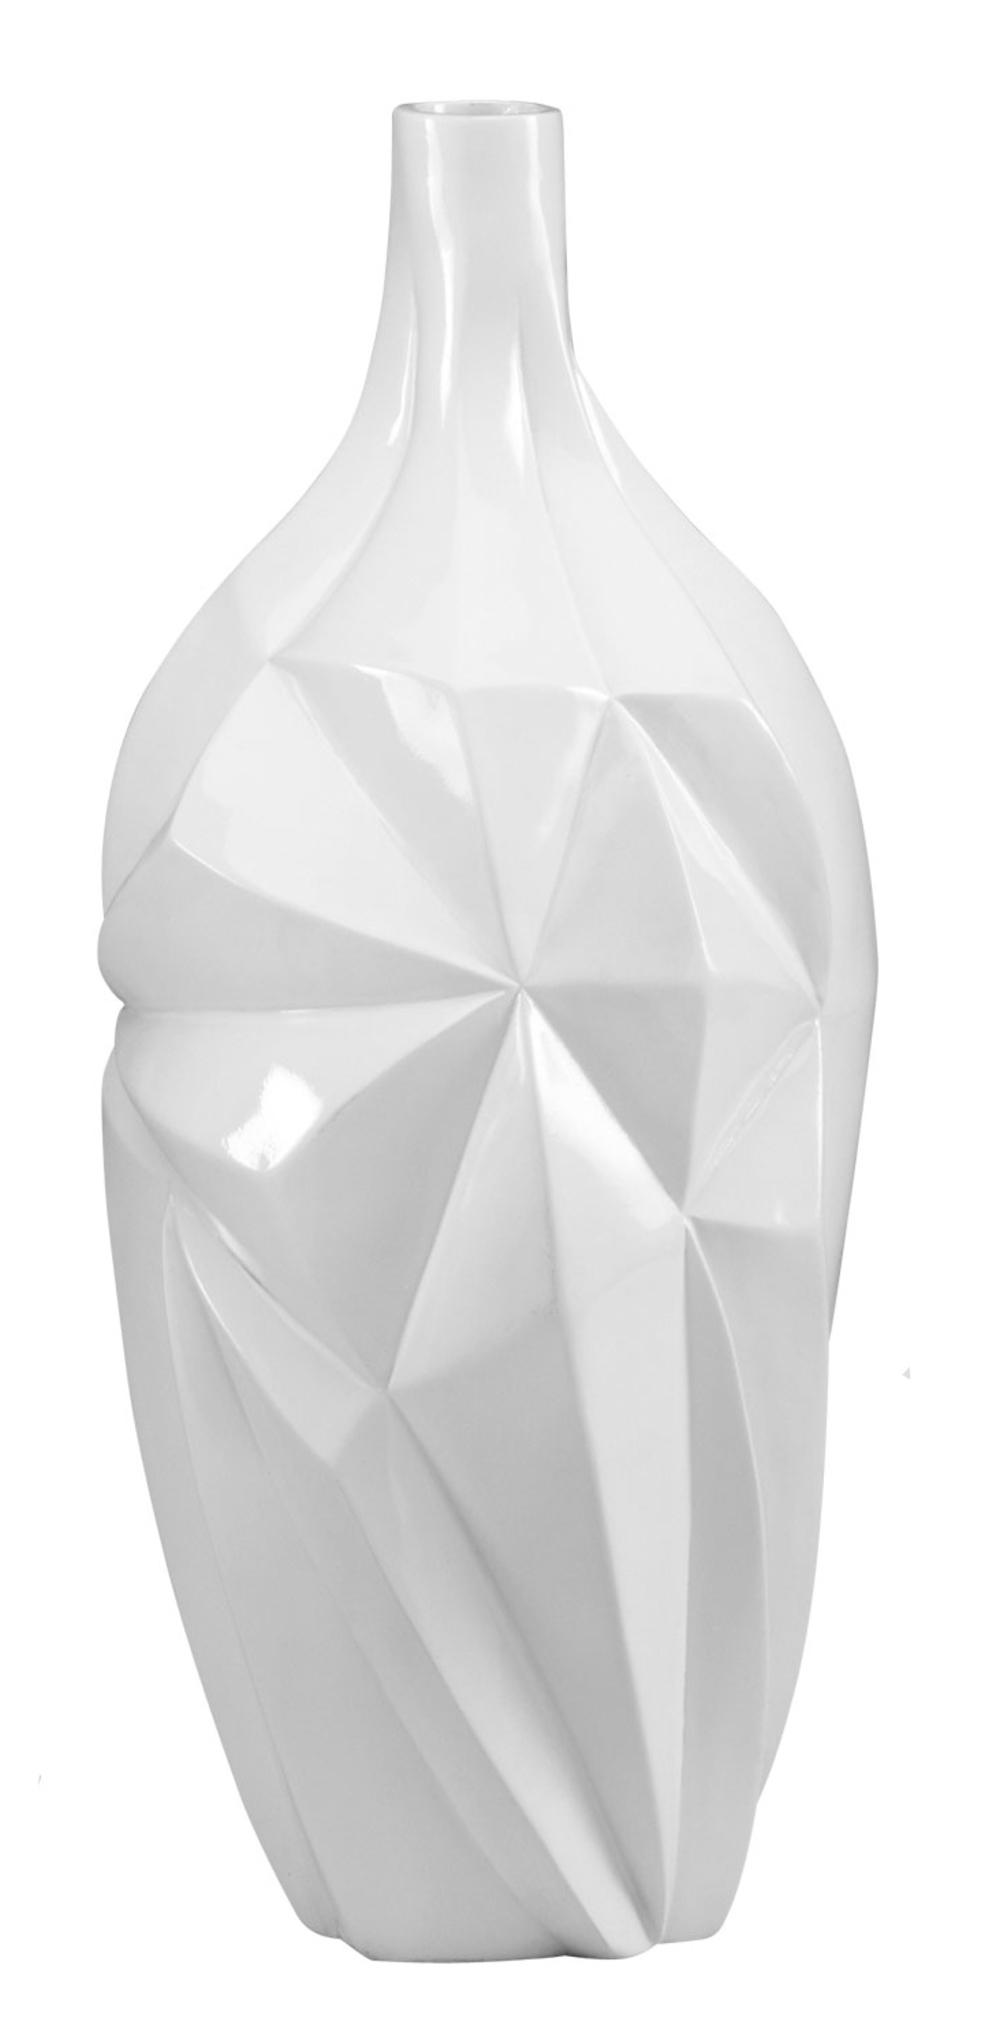 Cyan Designs - Large Glacier Vase